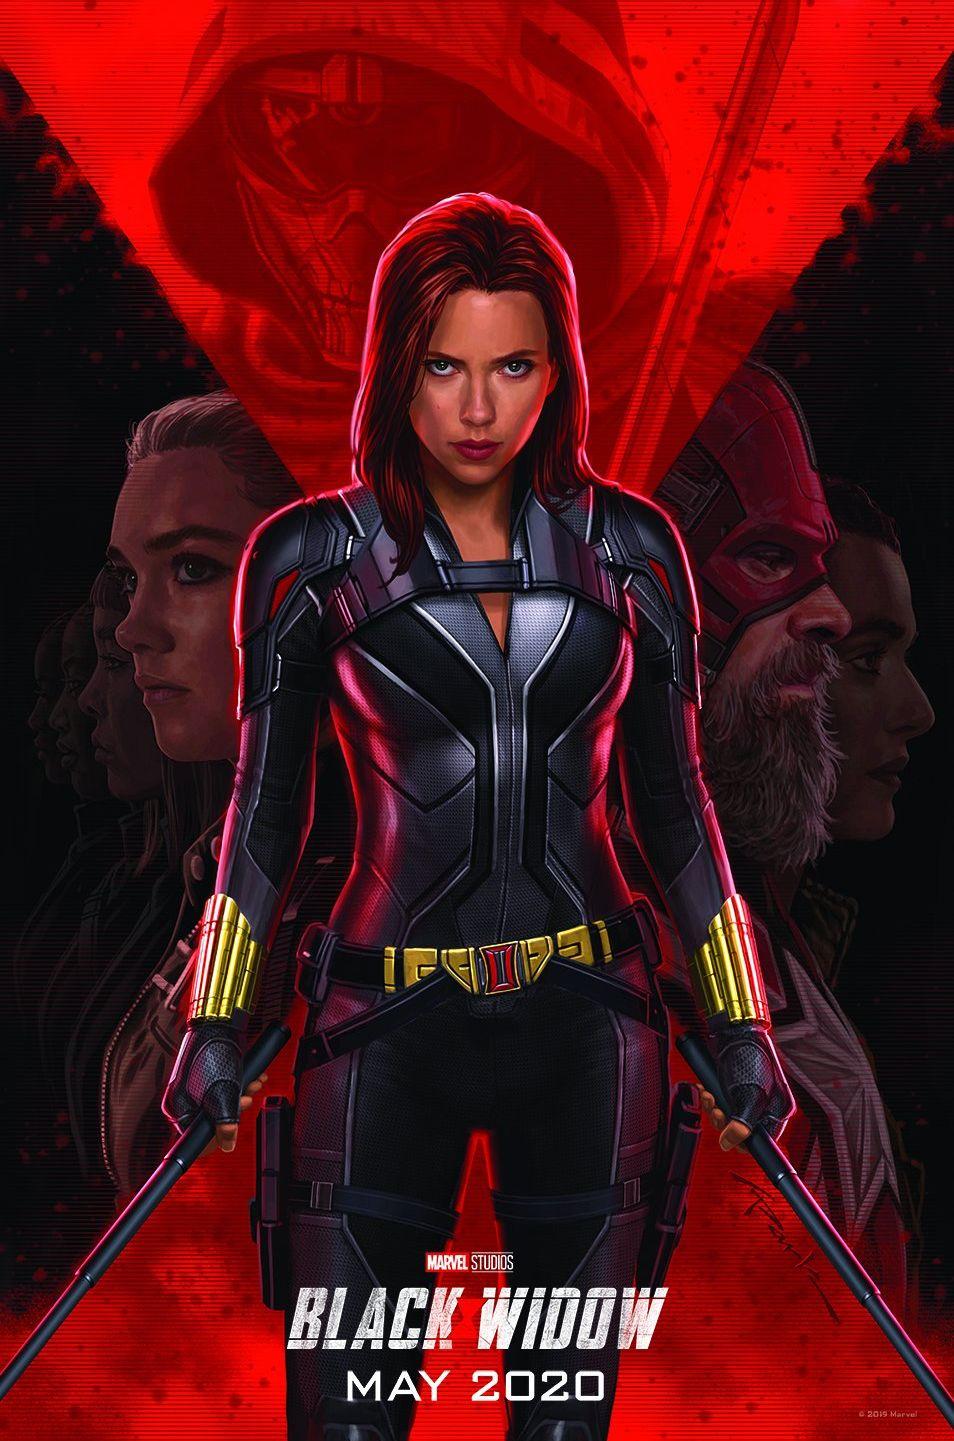 'Black Widow' Poster